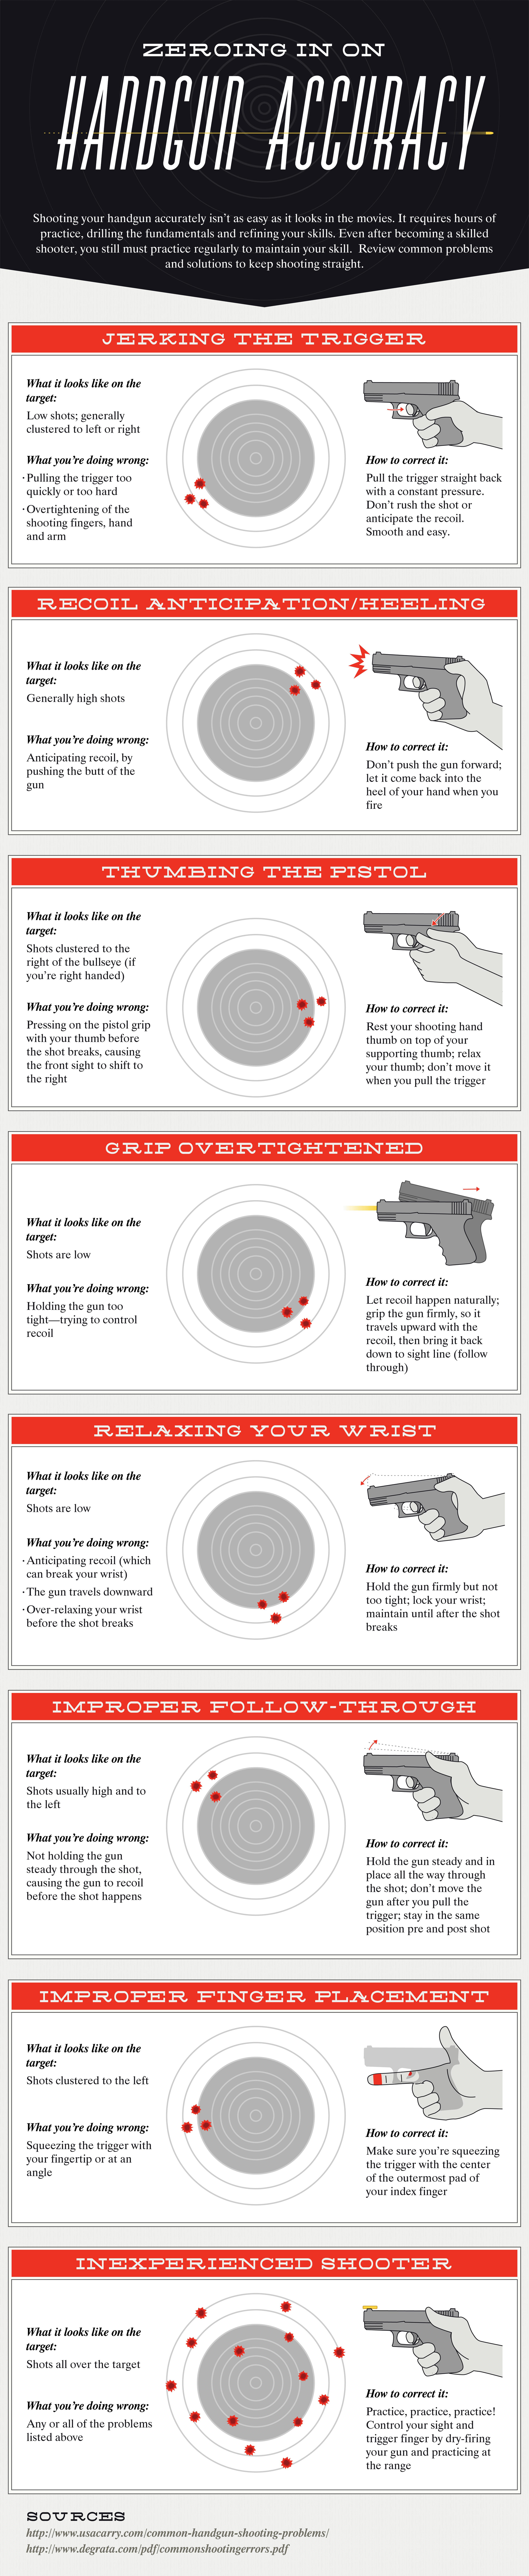 Handgun Accuracy Infographic American Preppers Network